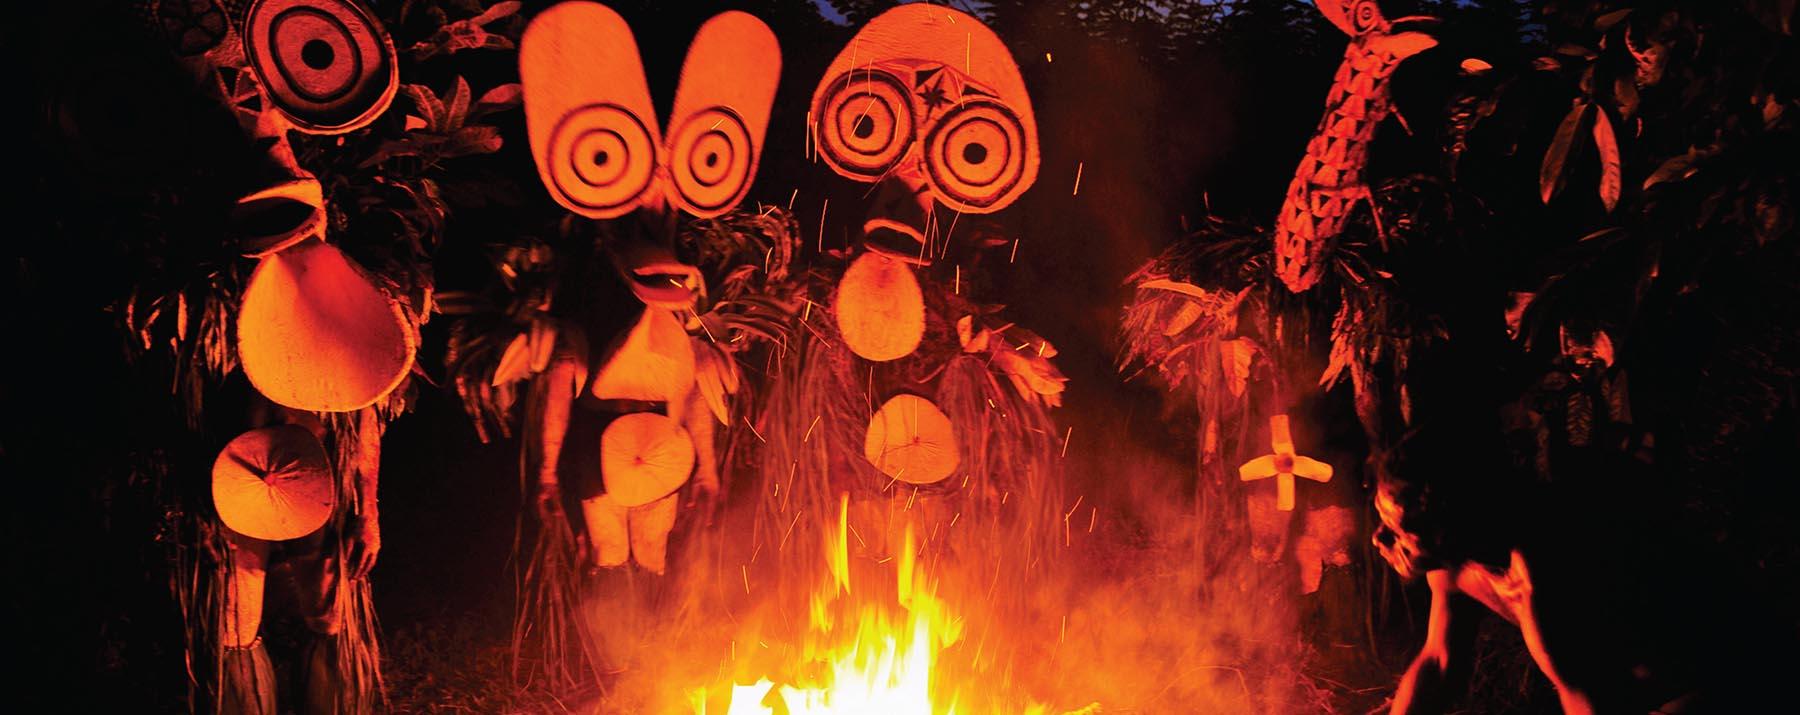 Baining Fire dancers